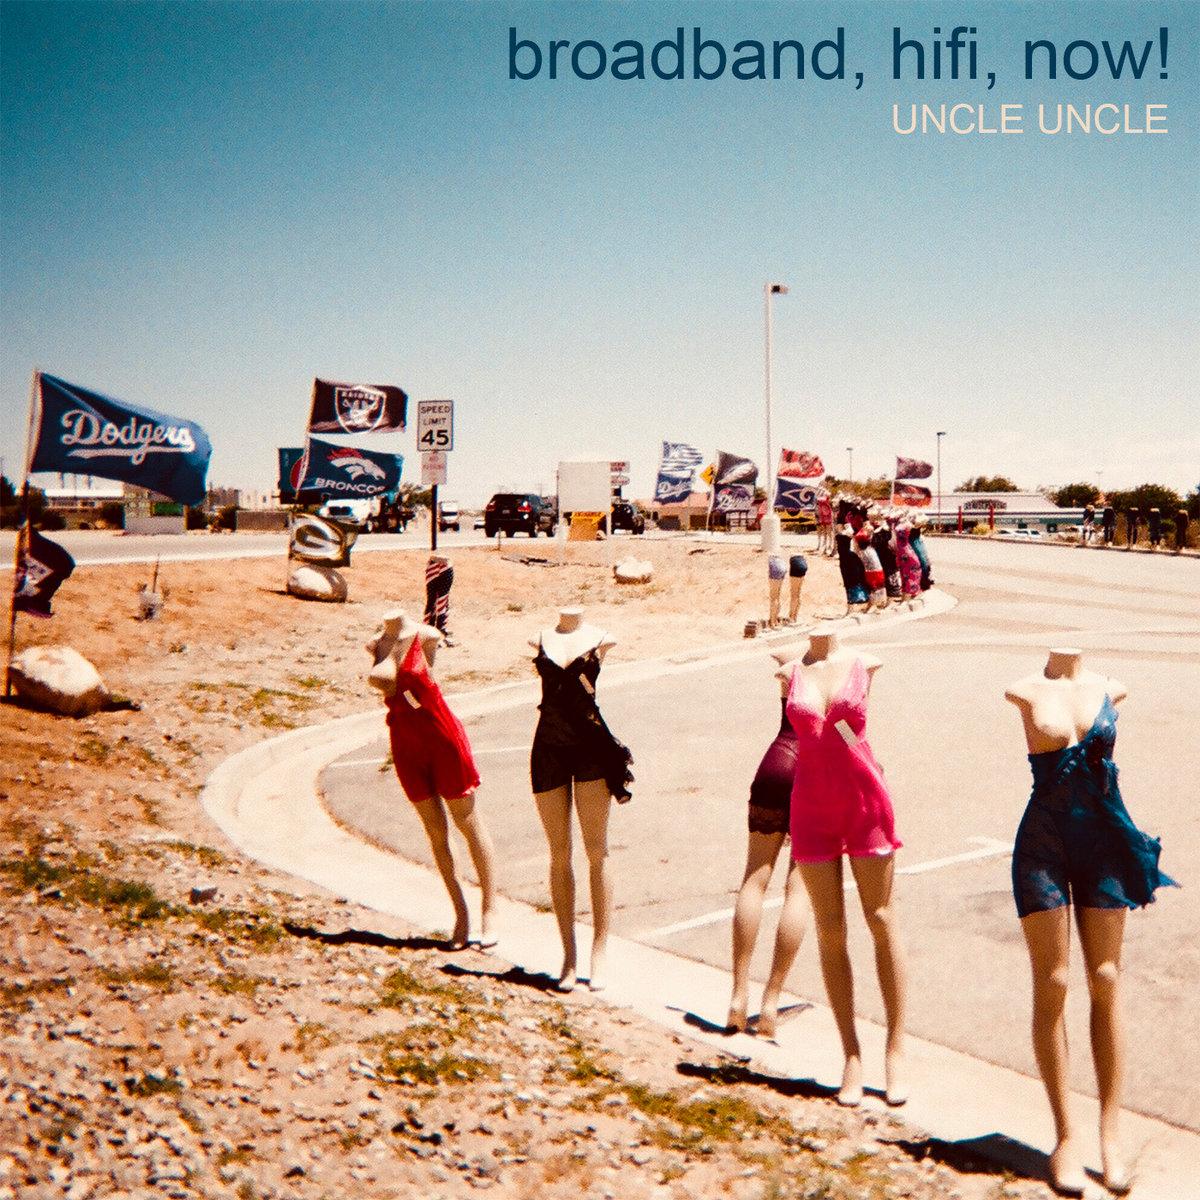 Uncle Uncle – Broadband, Hifi, Now!